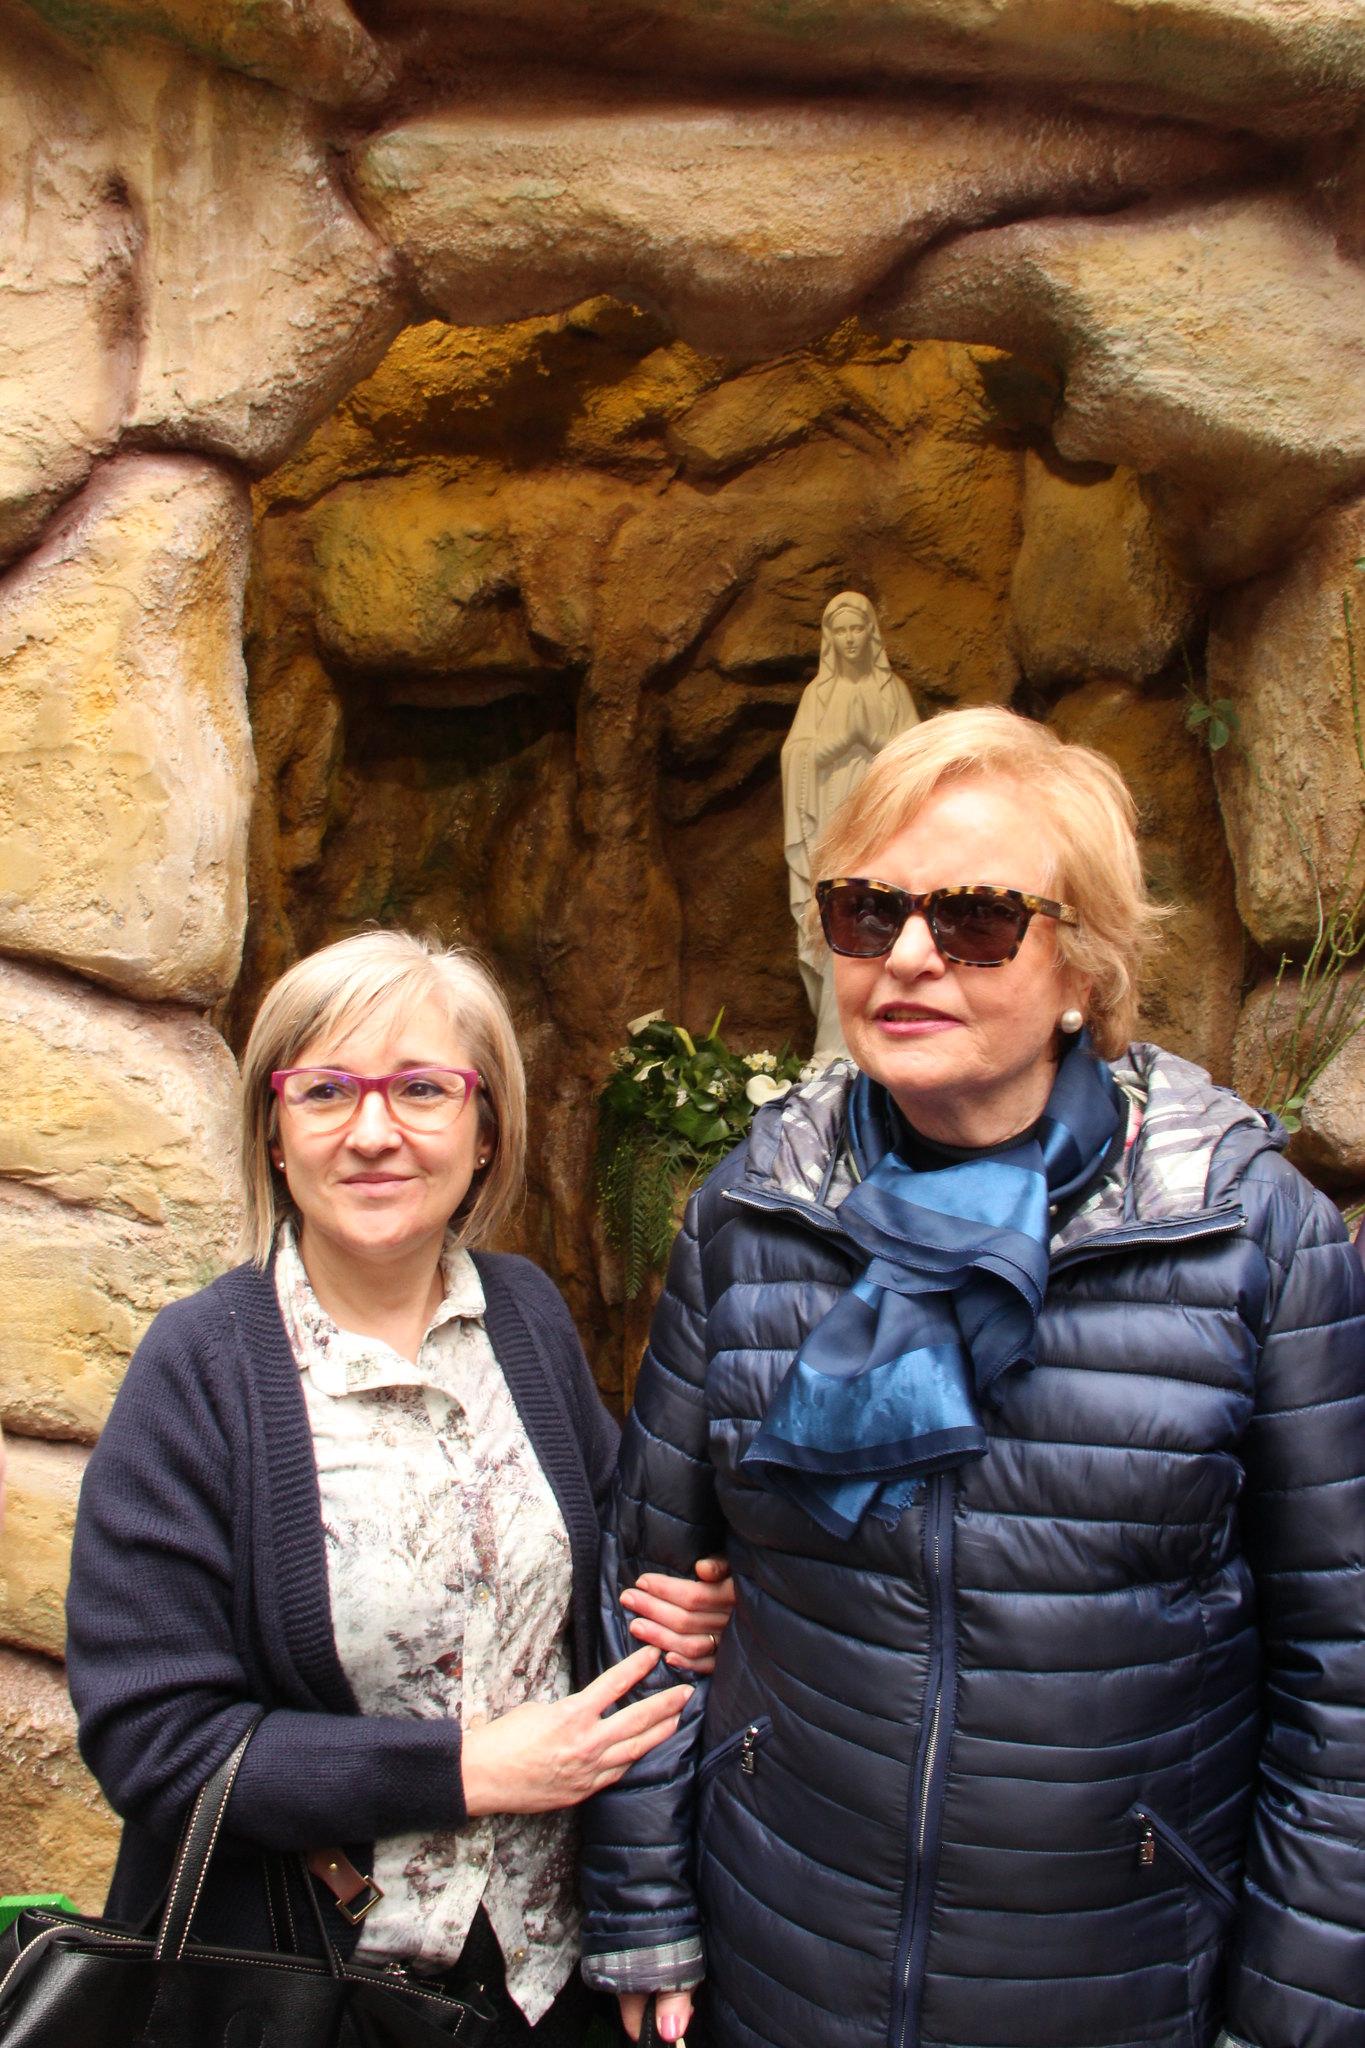 (2016-02-13) - Inauguración Virgen De Lourdes, La Molineta - Archivo La Molineta (099)